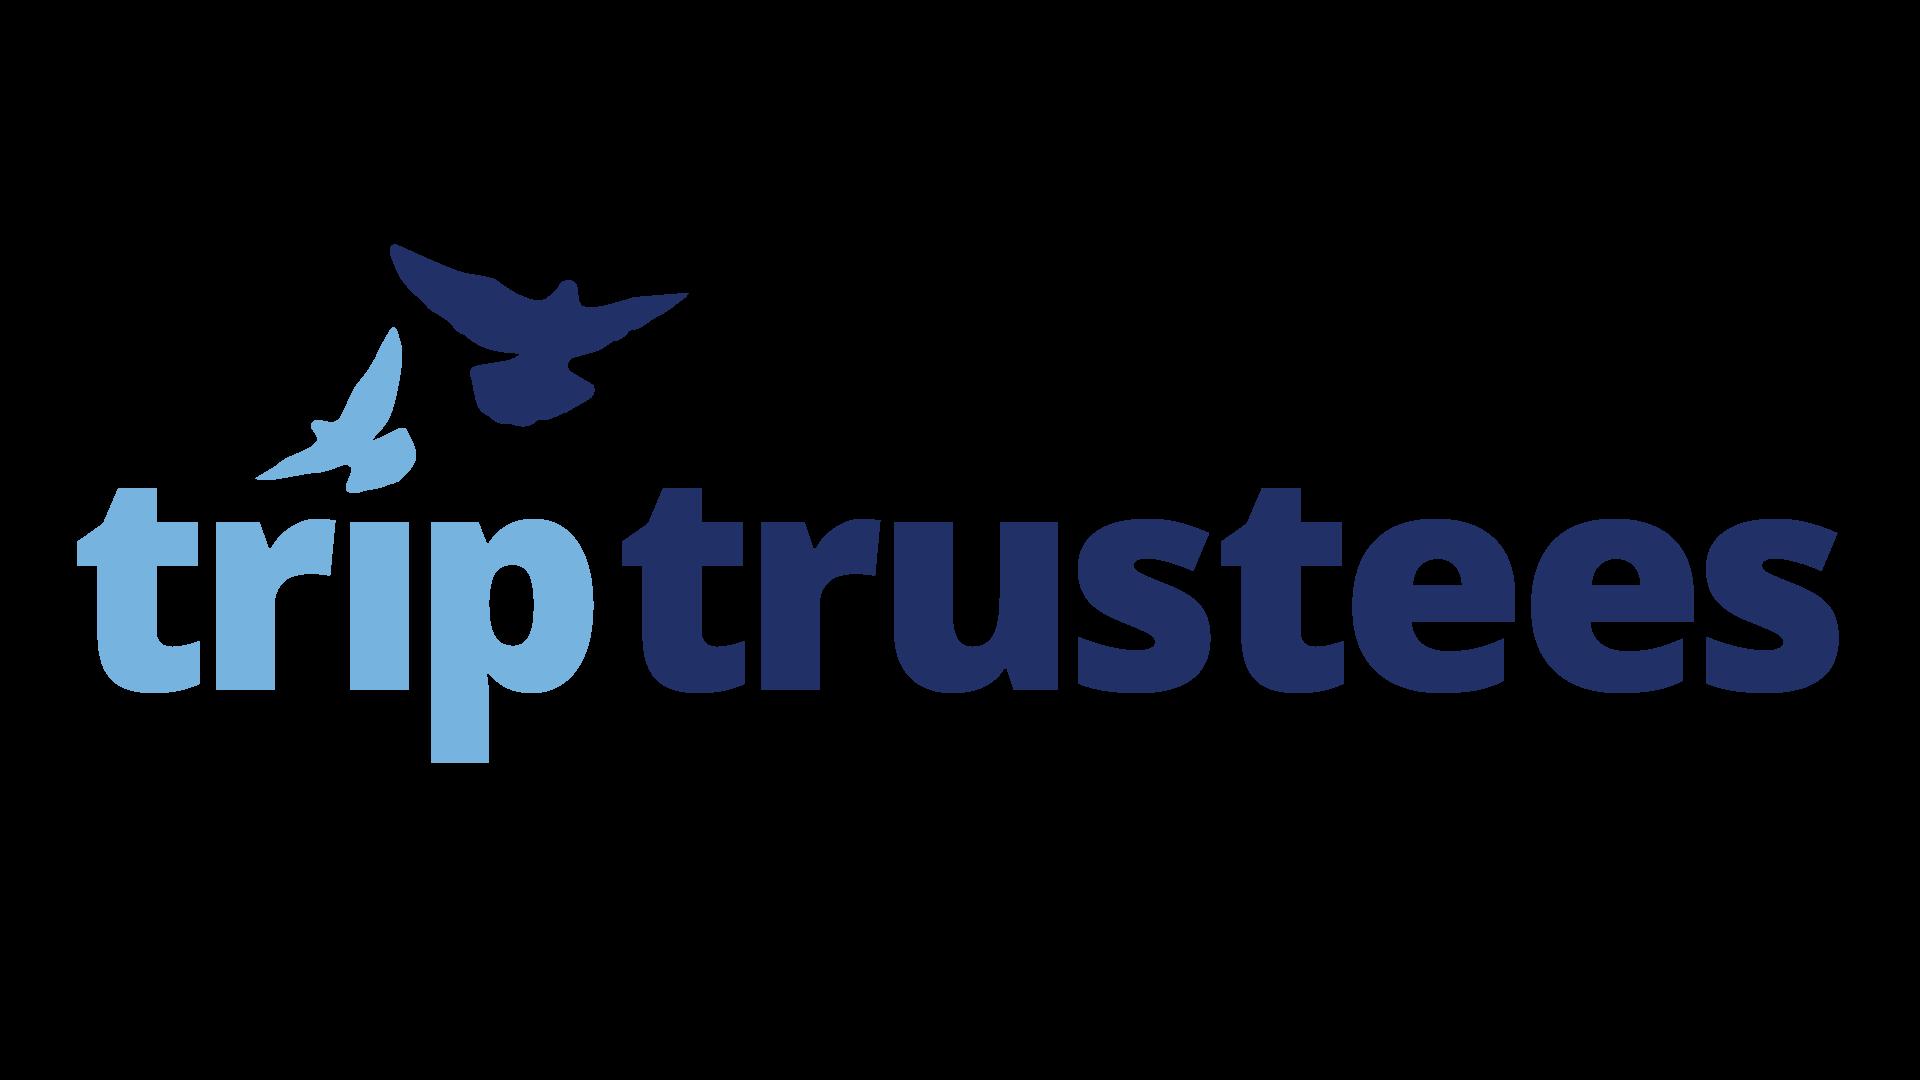 Trip Trustees